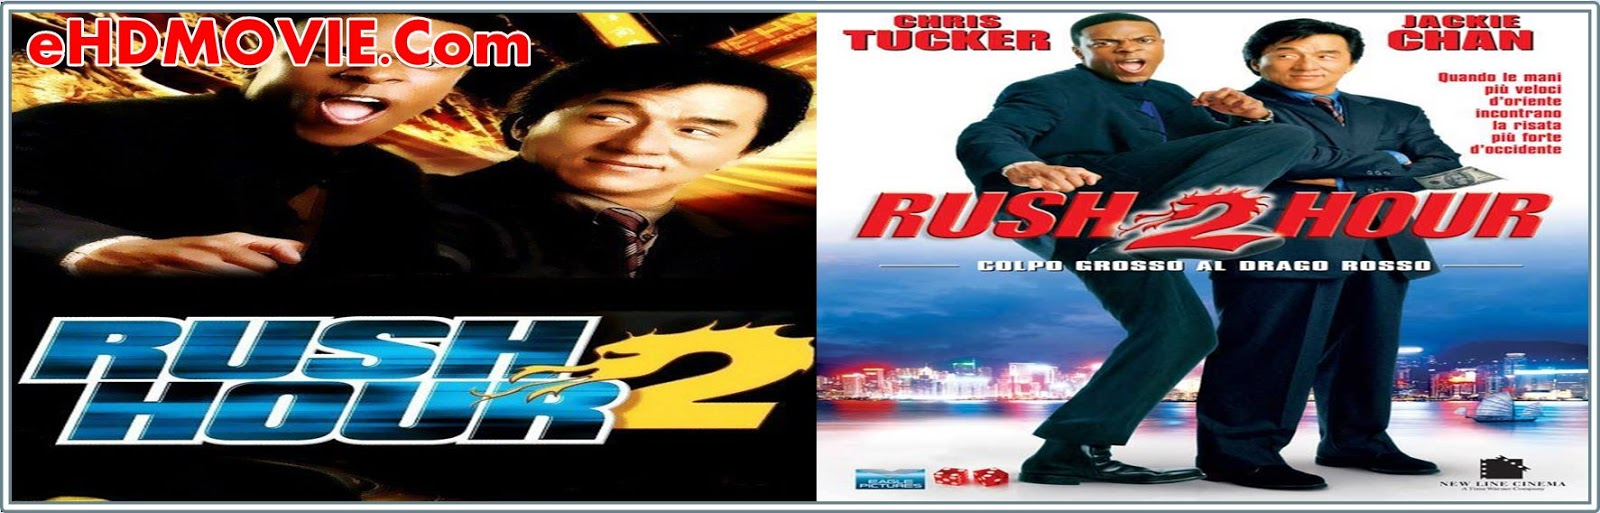 Rush Hour 2 2001 Full Movie Dual Audio [Hindi – English] 720p - 480p ORG BRRip 350MB - 850MB ESubs Free Download